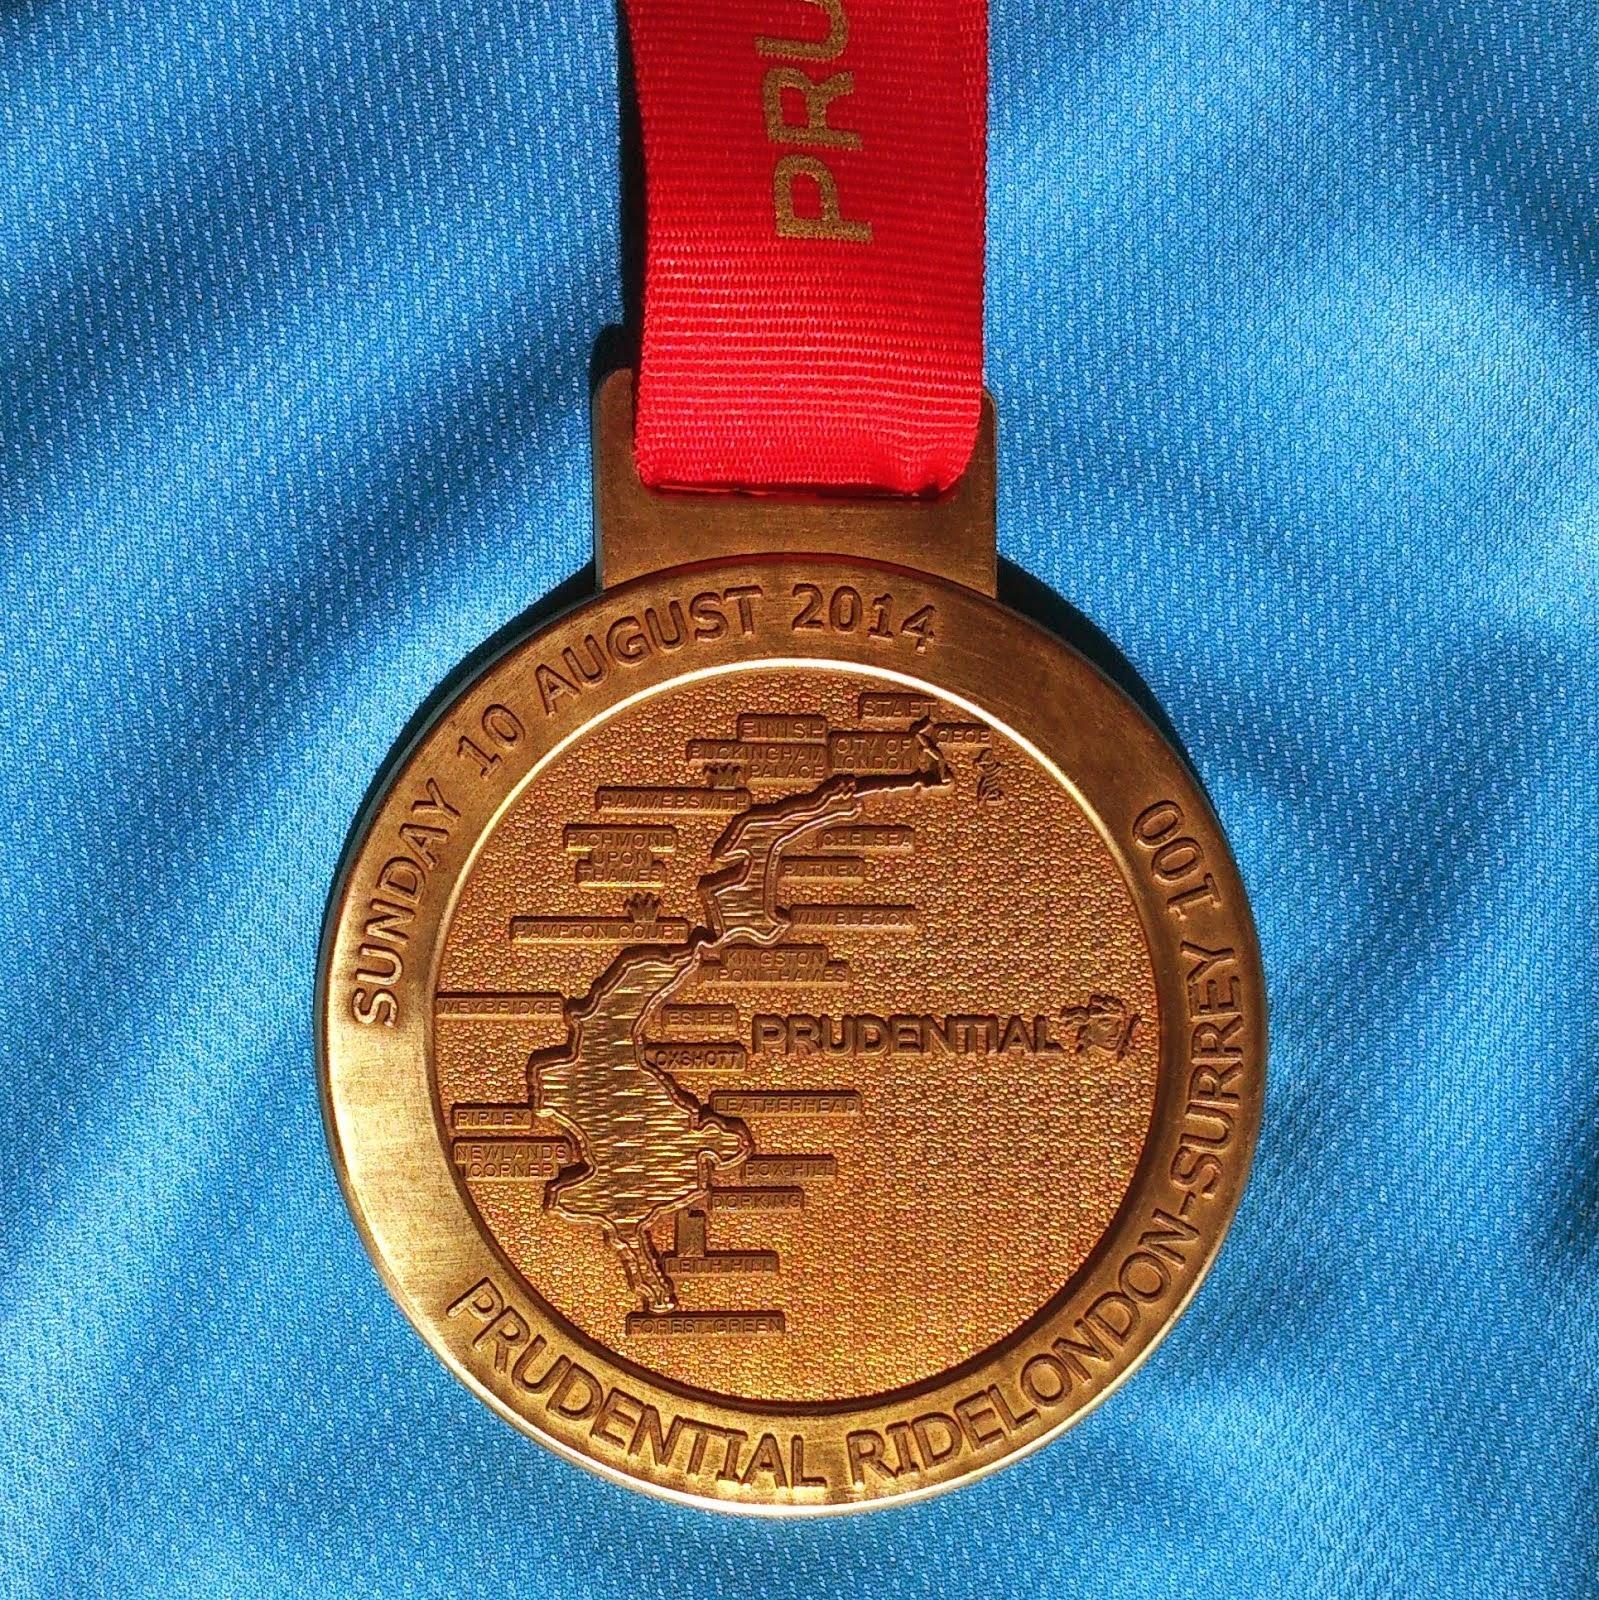 RideLondon-Surrey Medal